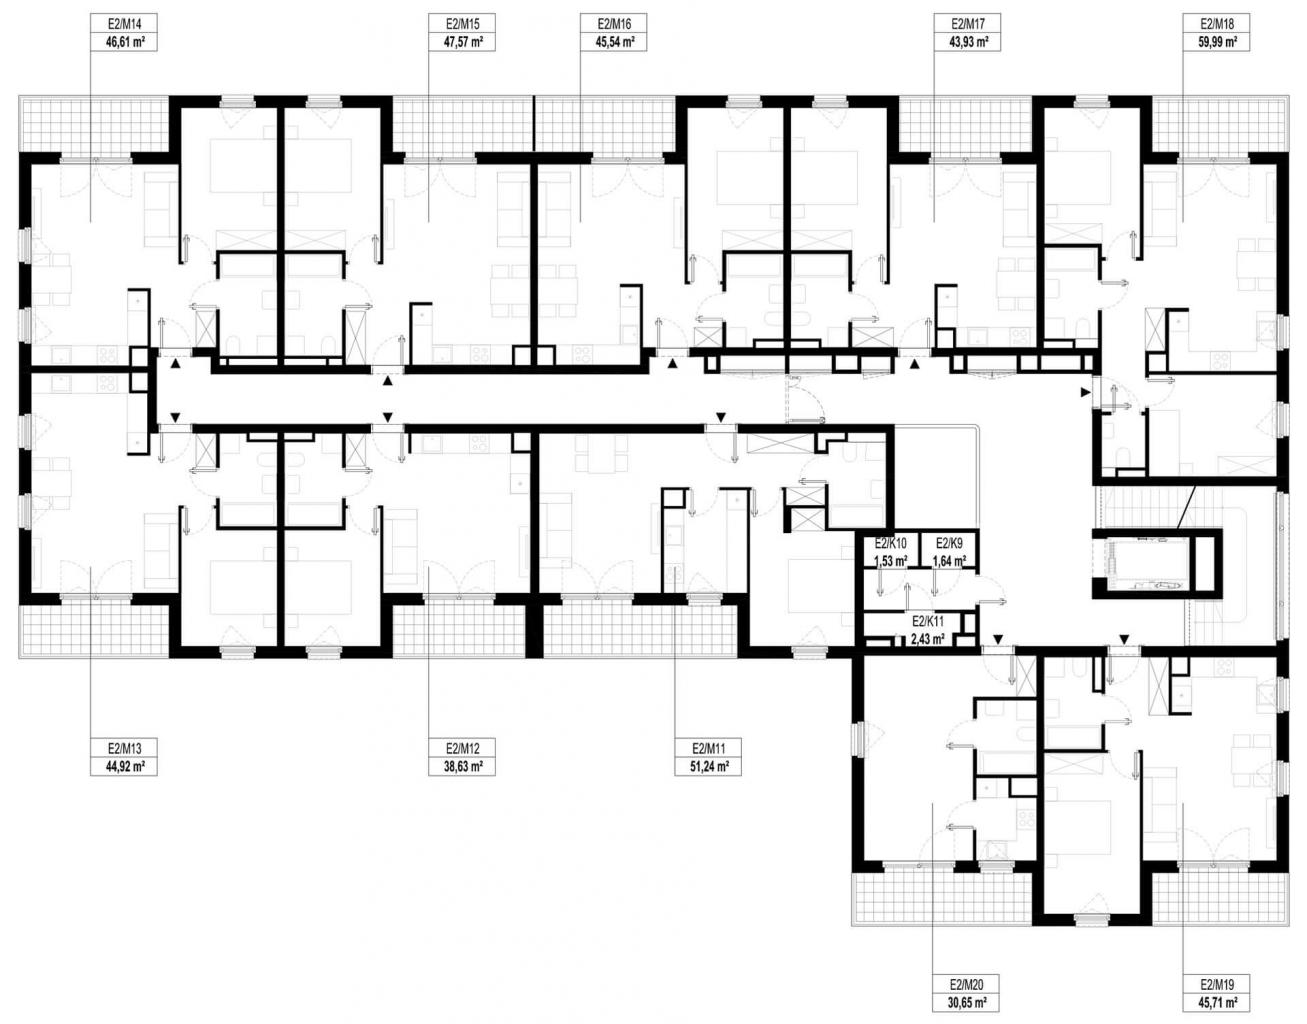 Etap 2 - Budynek E - Piętro 1